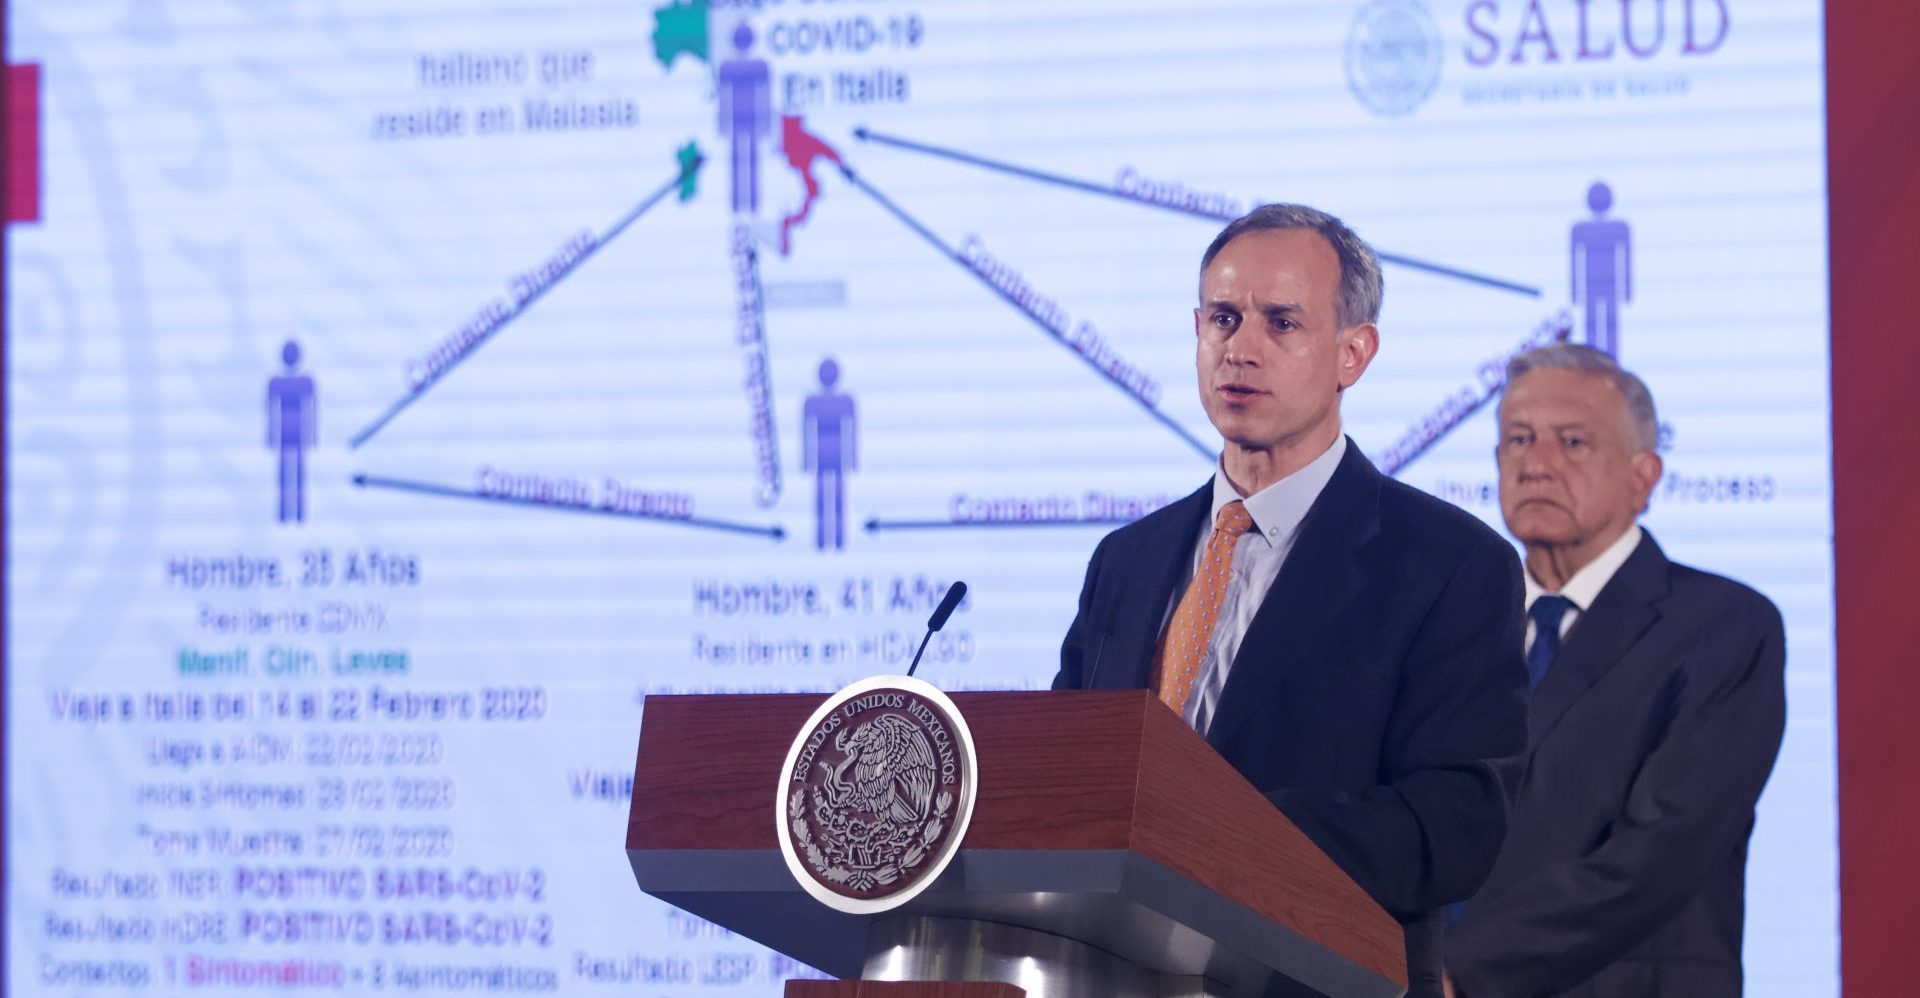 Gobierno pide tomar medidas preventivas contra coronavirus